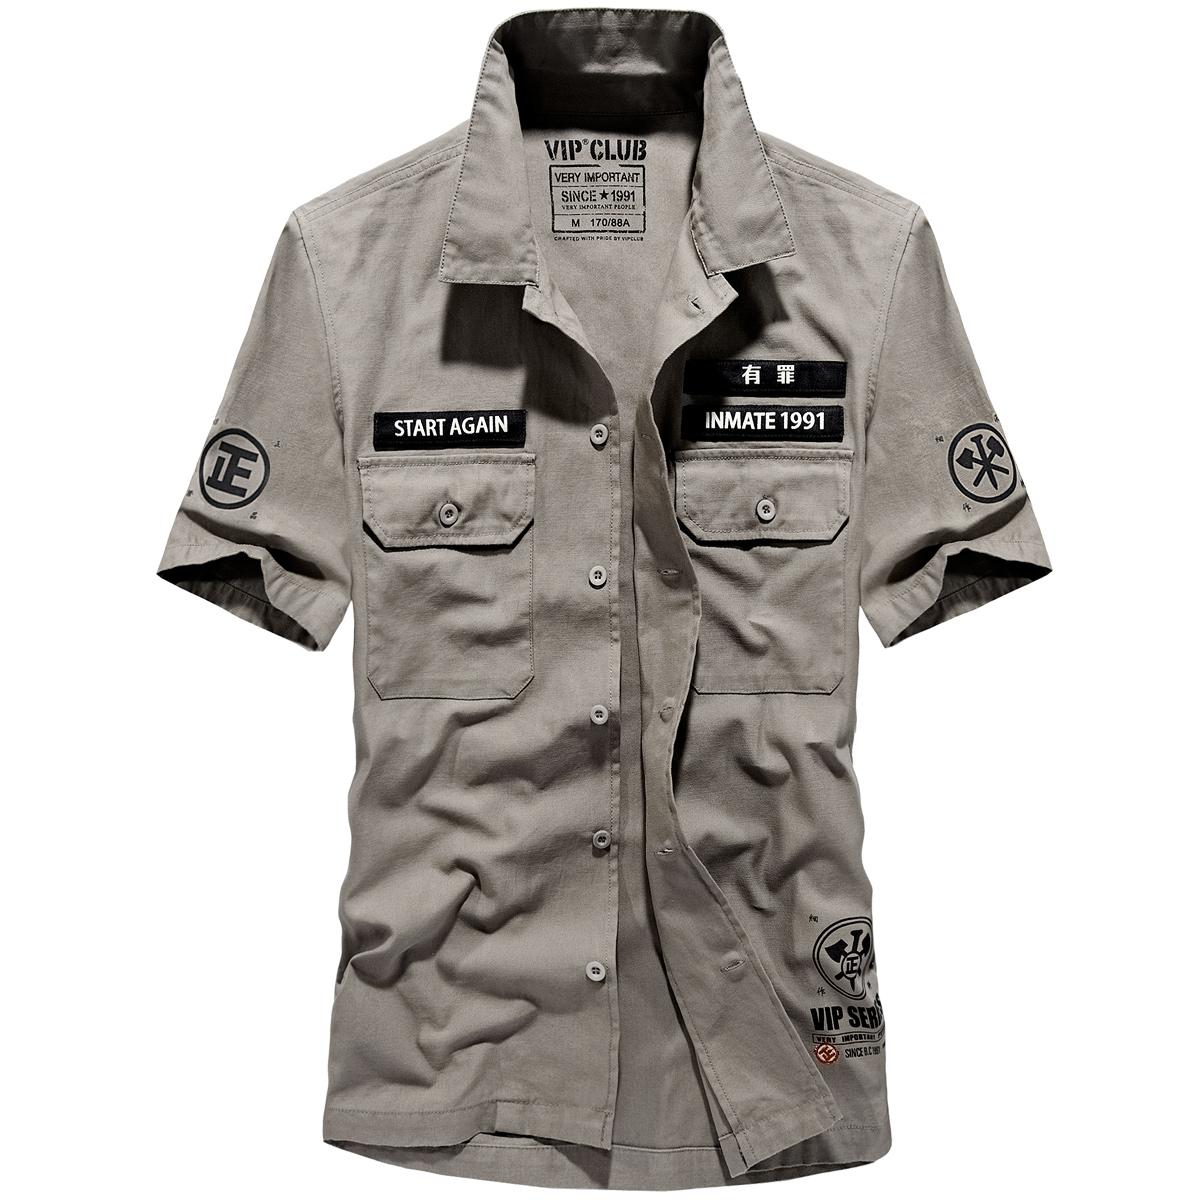 Denim Baru Katun Kemeja Lengan Pendek Biru Tua Panjang Olive Army Shirt Logo Jeans 24350l5gn Hijau M Flash Sale Tide Merek Korea Fashion Style Pria Slim Baju